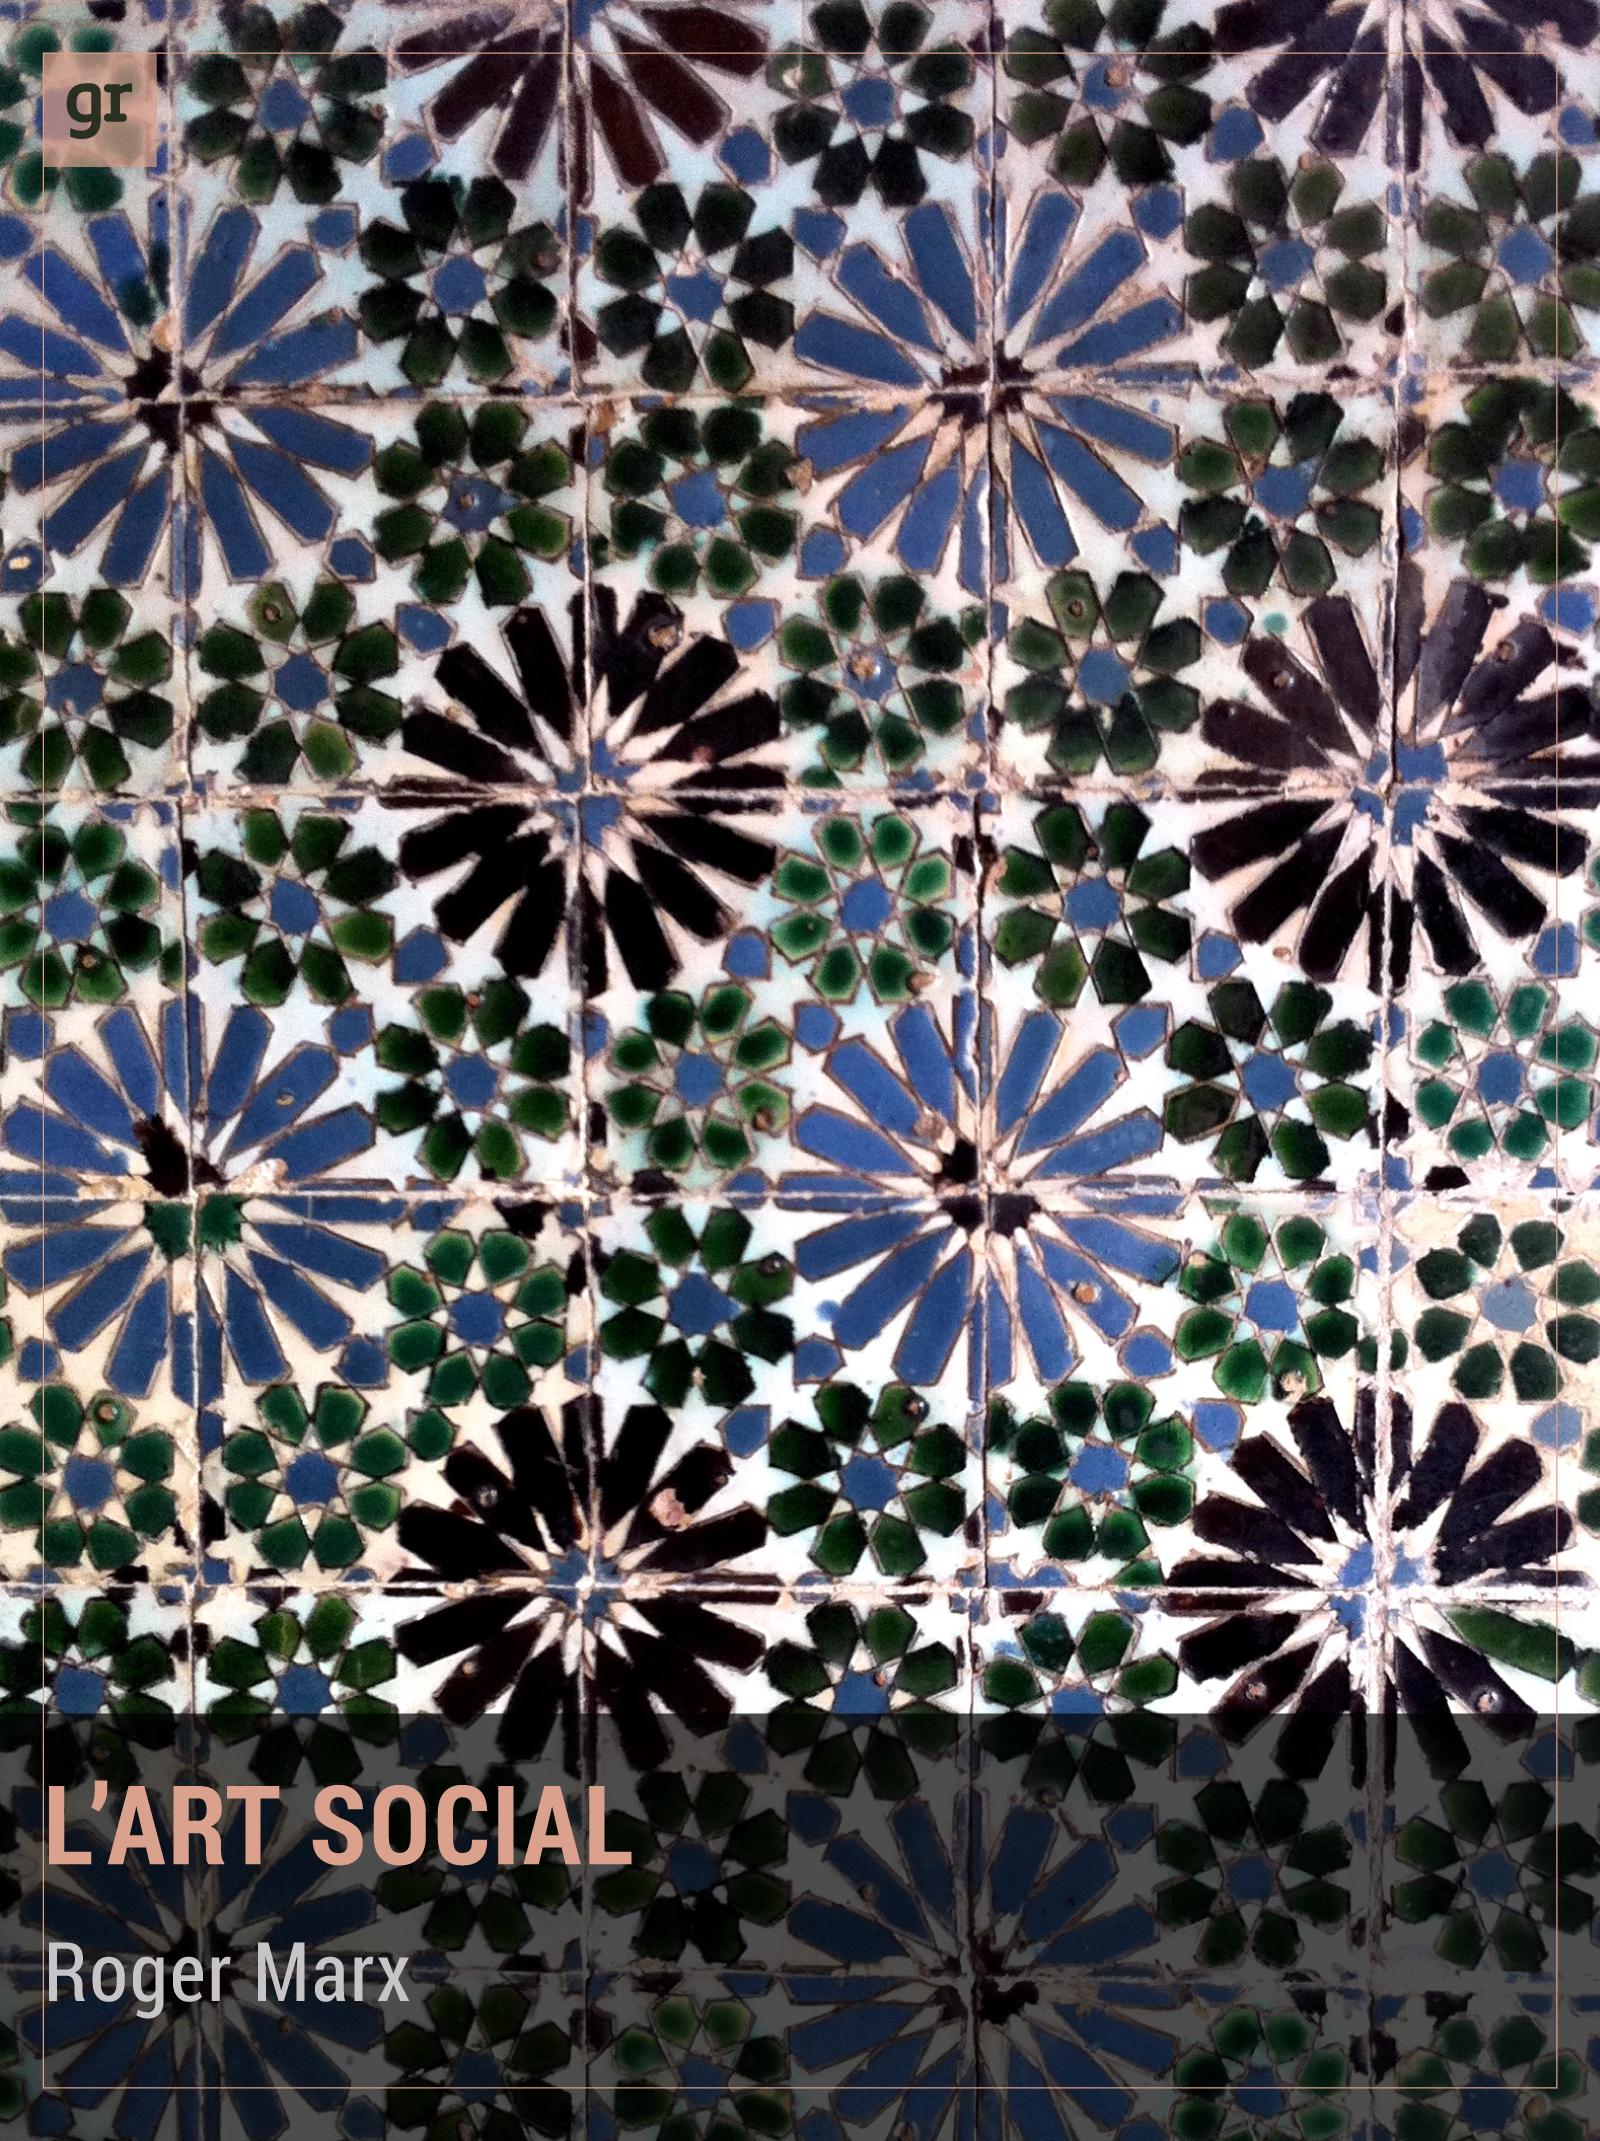 L'Art social, Manifeste artistique et social